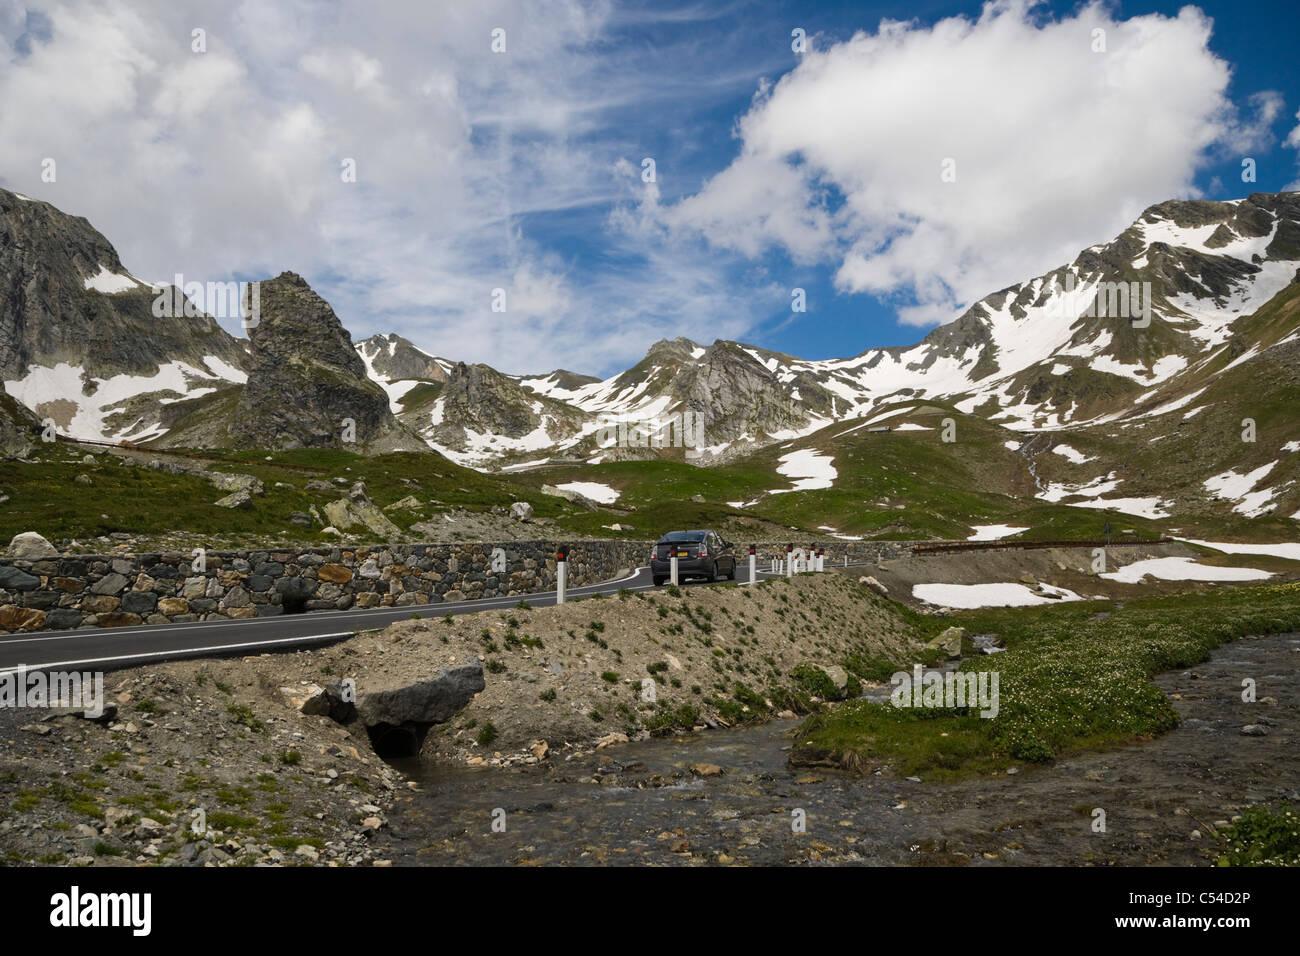 Valais Alps from Great St Bernard Pass, Col du Grand-Saint-Bernard, Colle del Gran San Bernardo, Western Alps, Italy Stock Photo